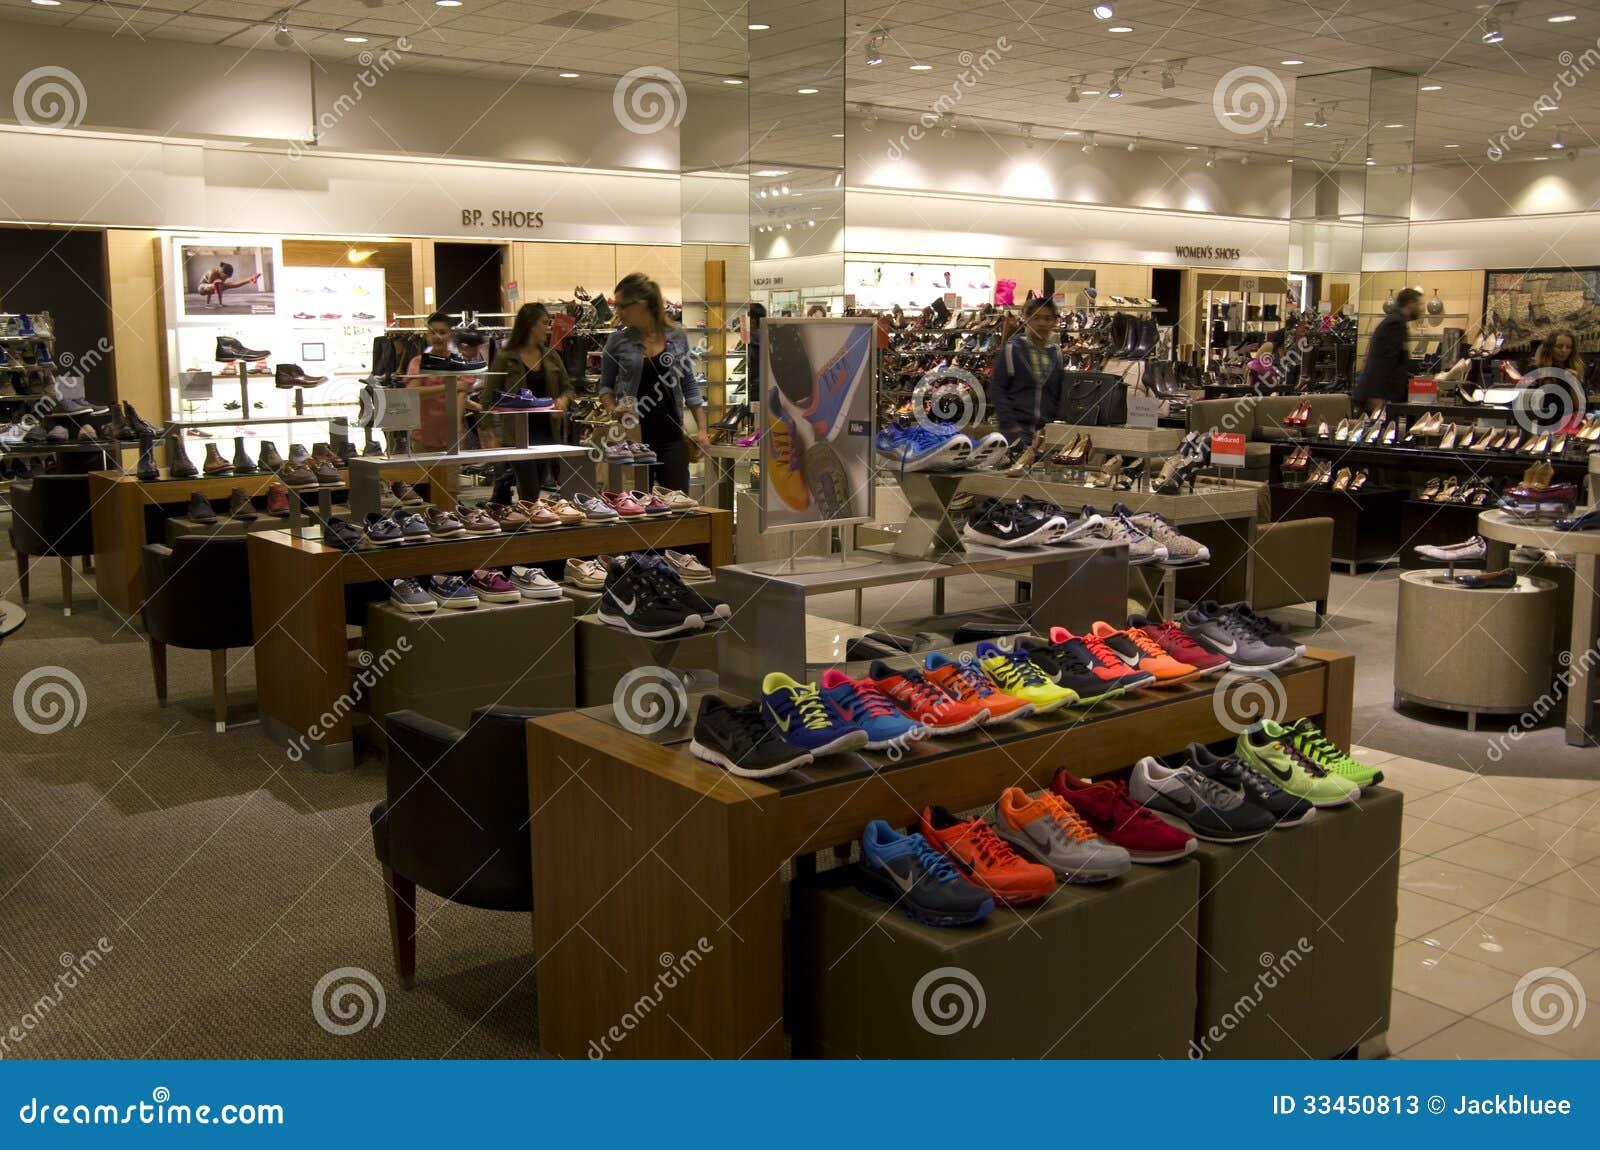 Shoes for men online Shoes department store online